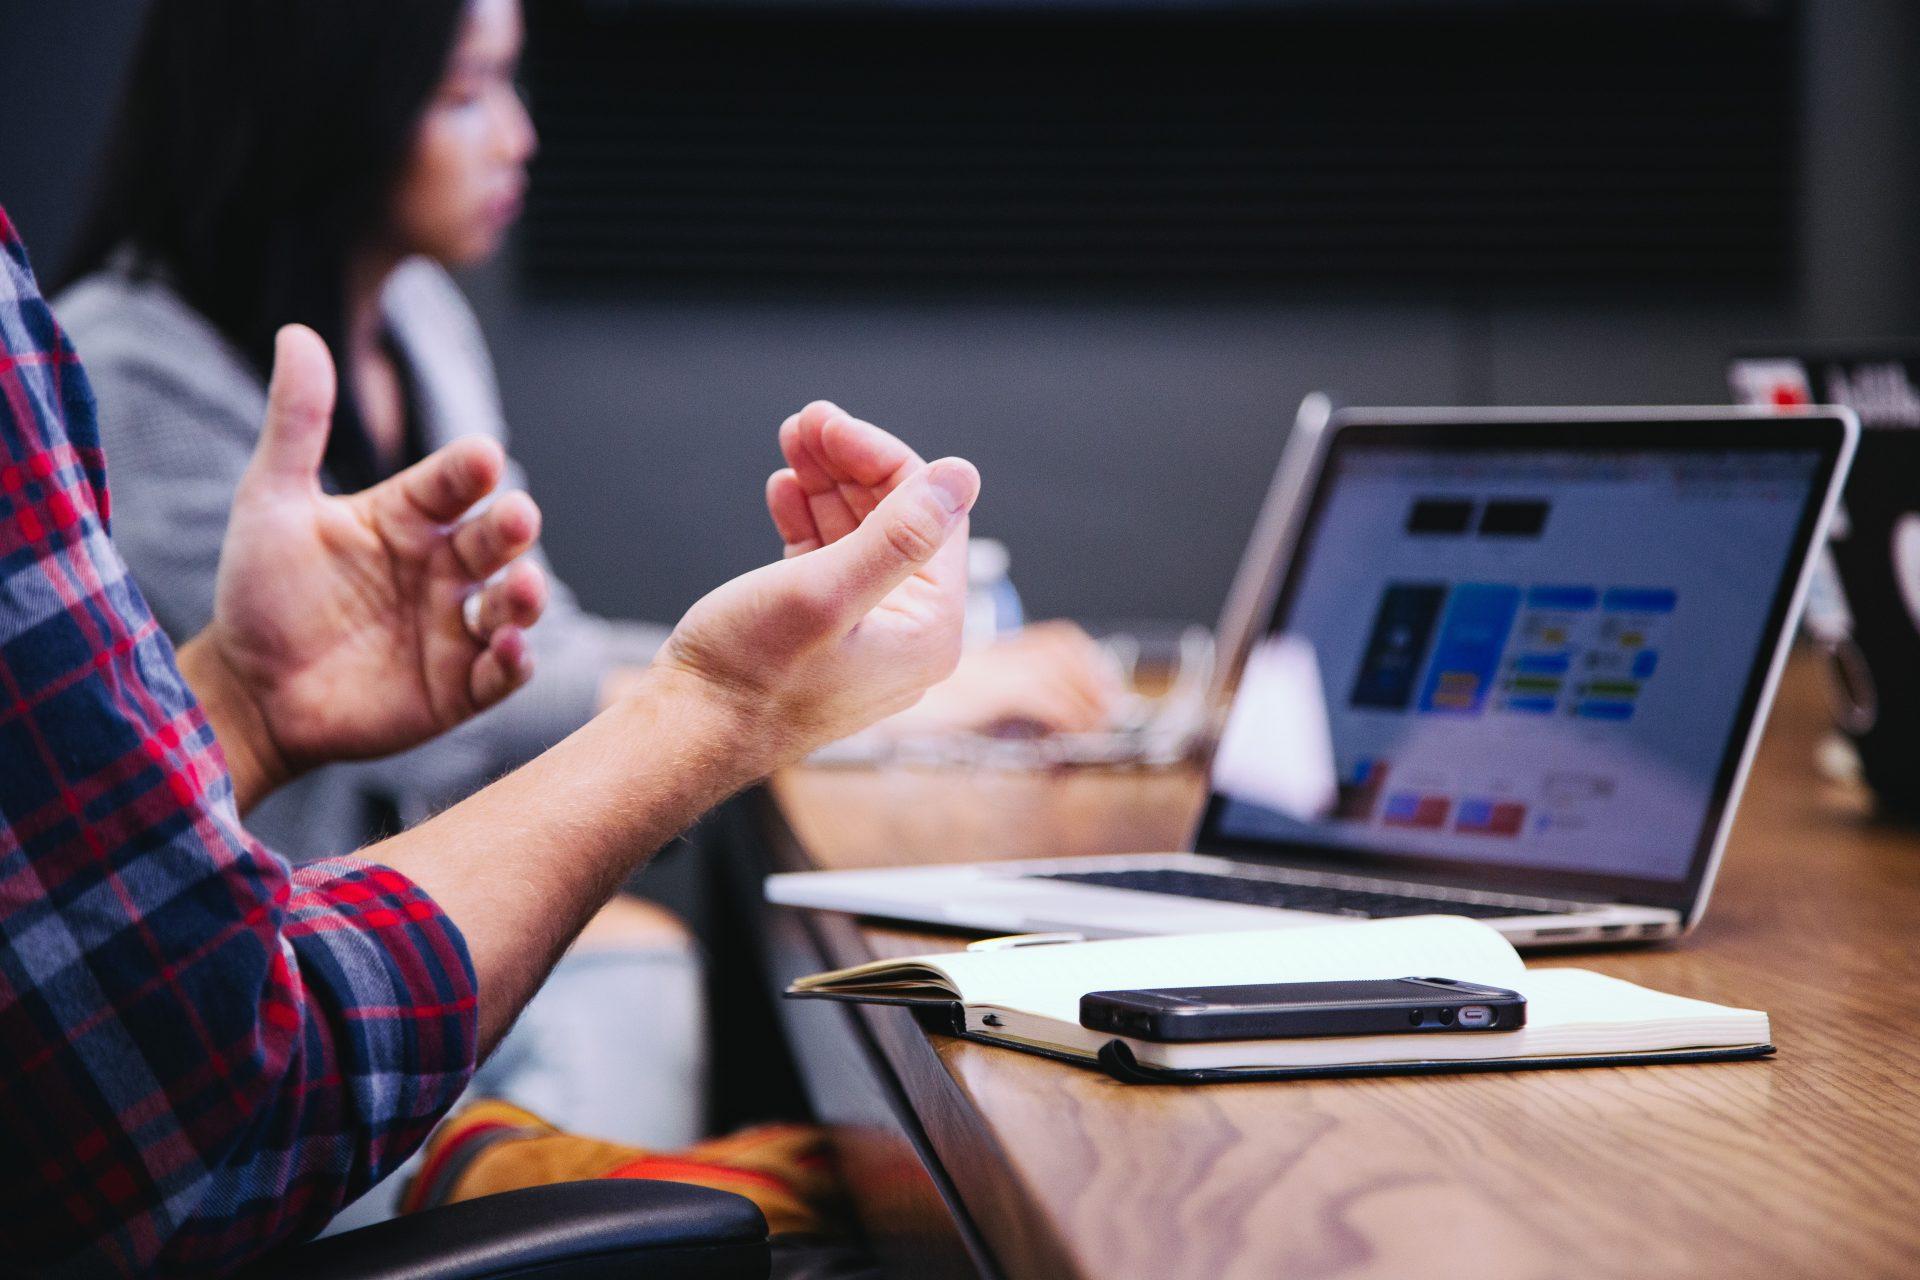 Negotiating through the agile world